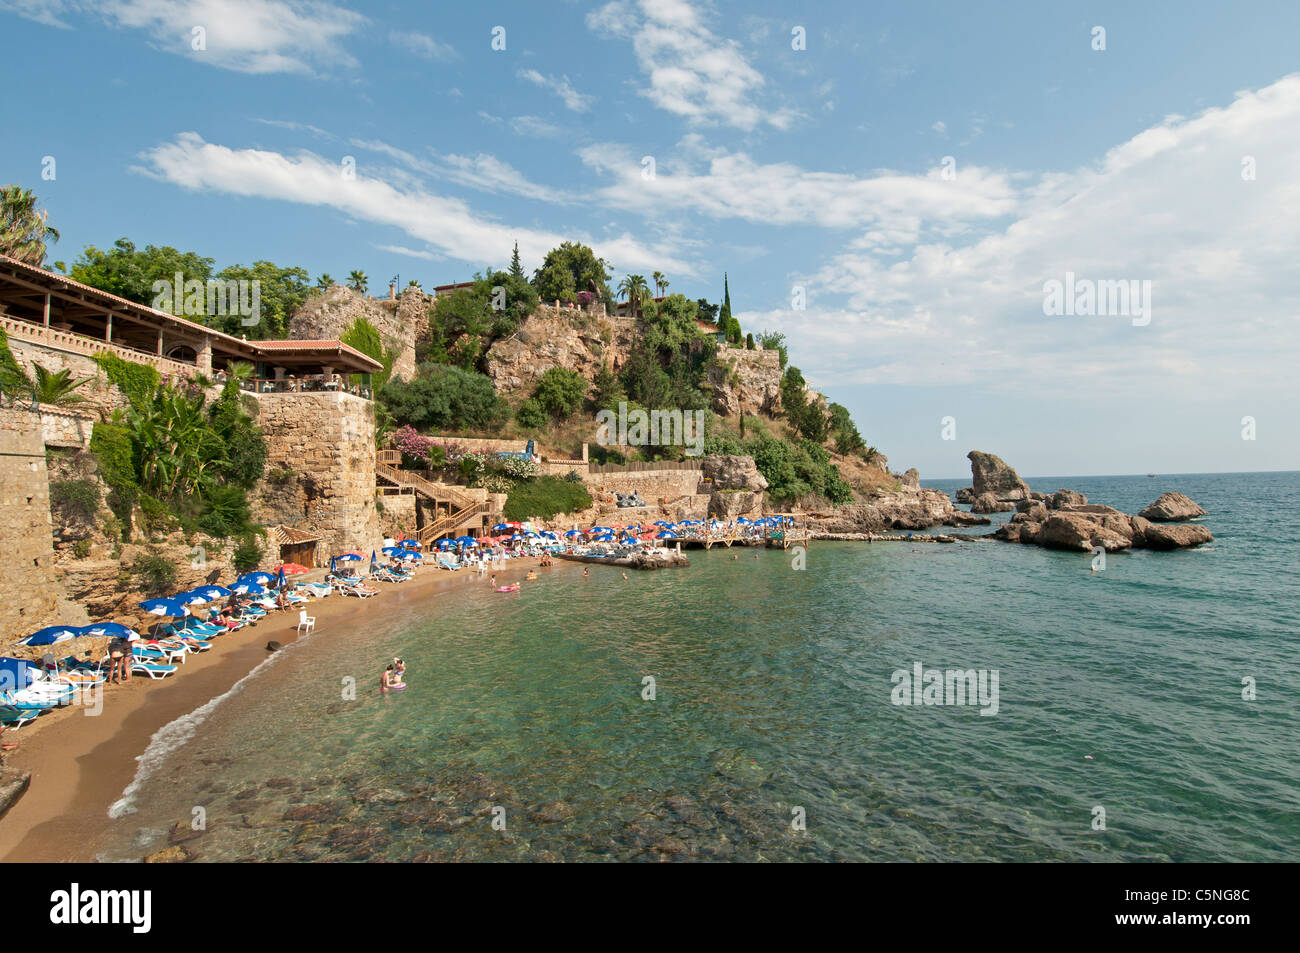 Antalya Turkey old City Town Beach Sea Shore near old Port - Stock Image